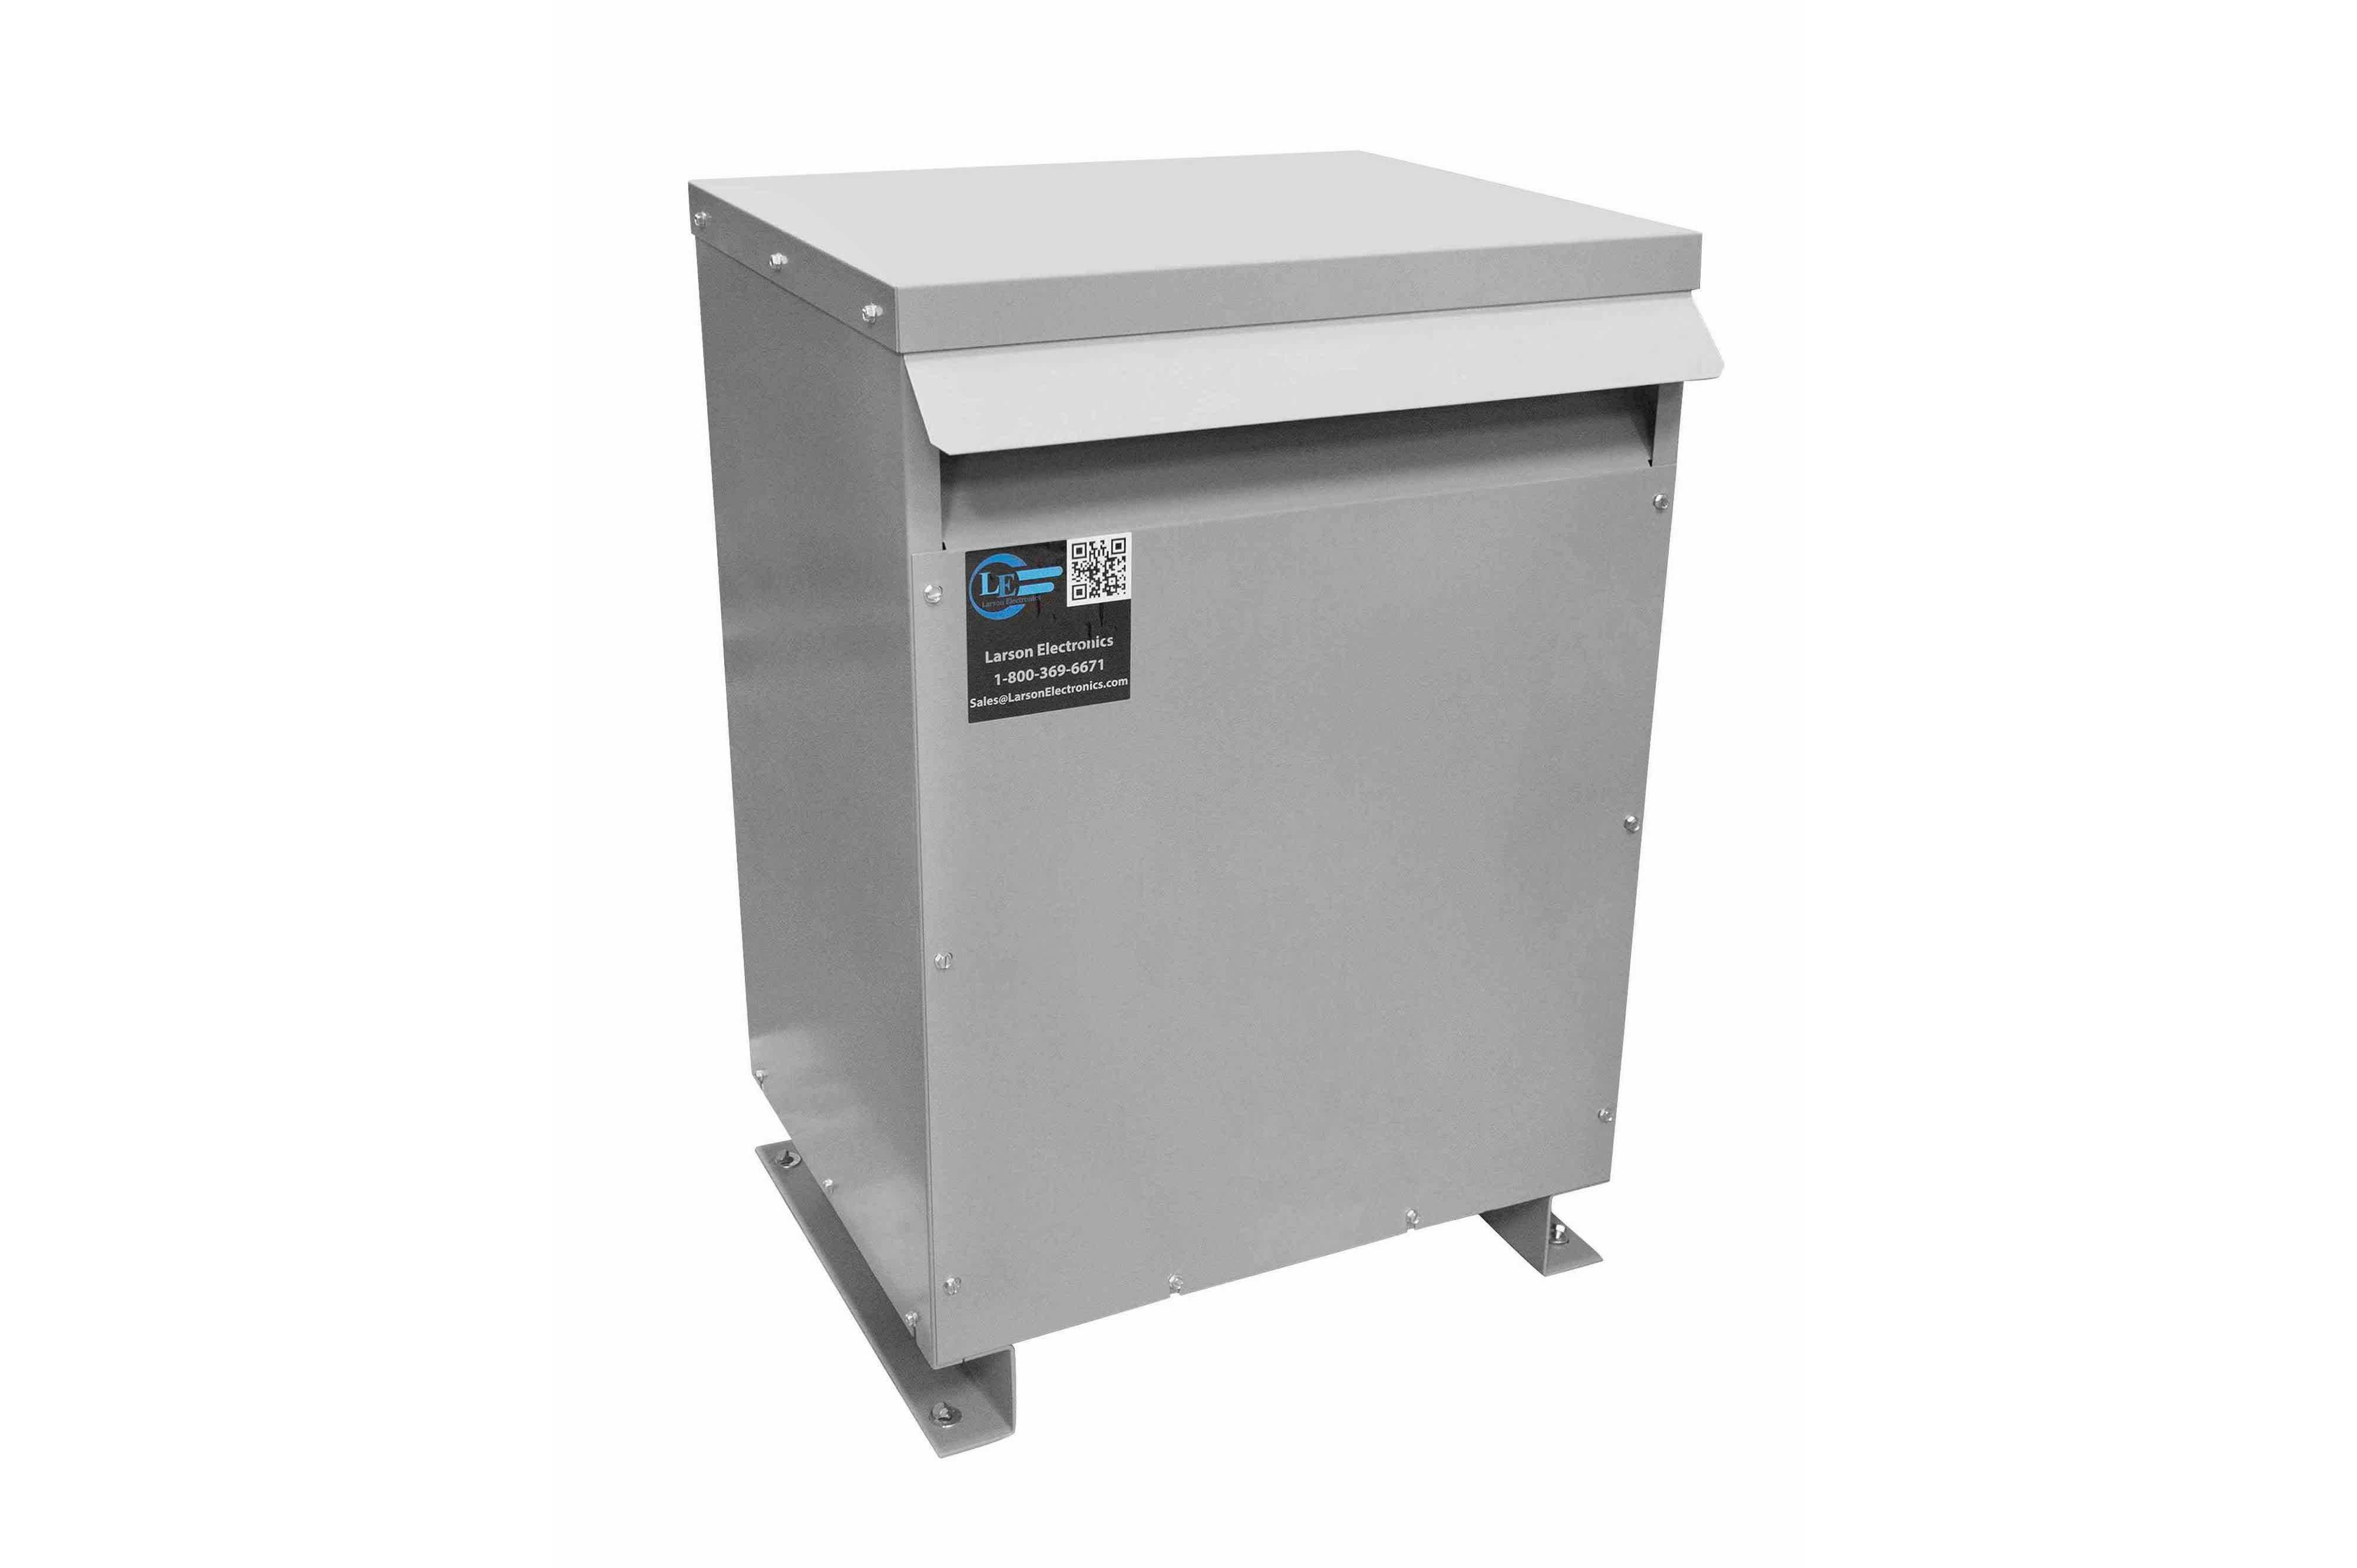 9 kVA 3PH Isolation Transformer, 480V Wye Primary, 380V Delta Secondary, N3R, Ventilated, 60 Hz